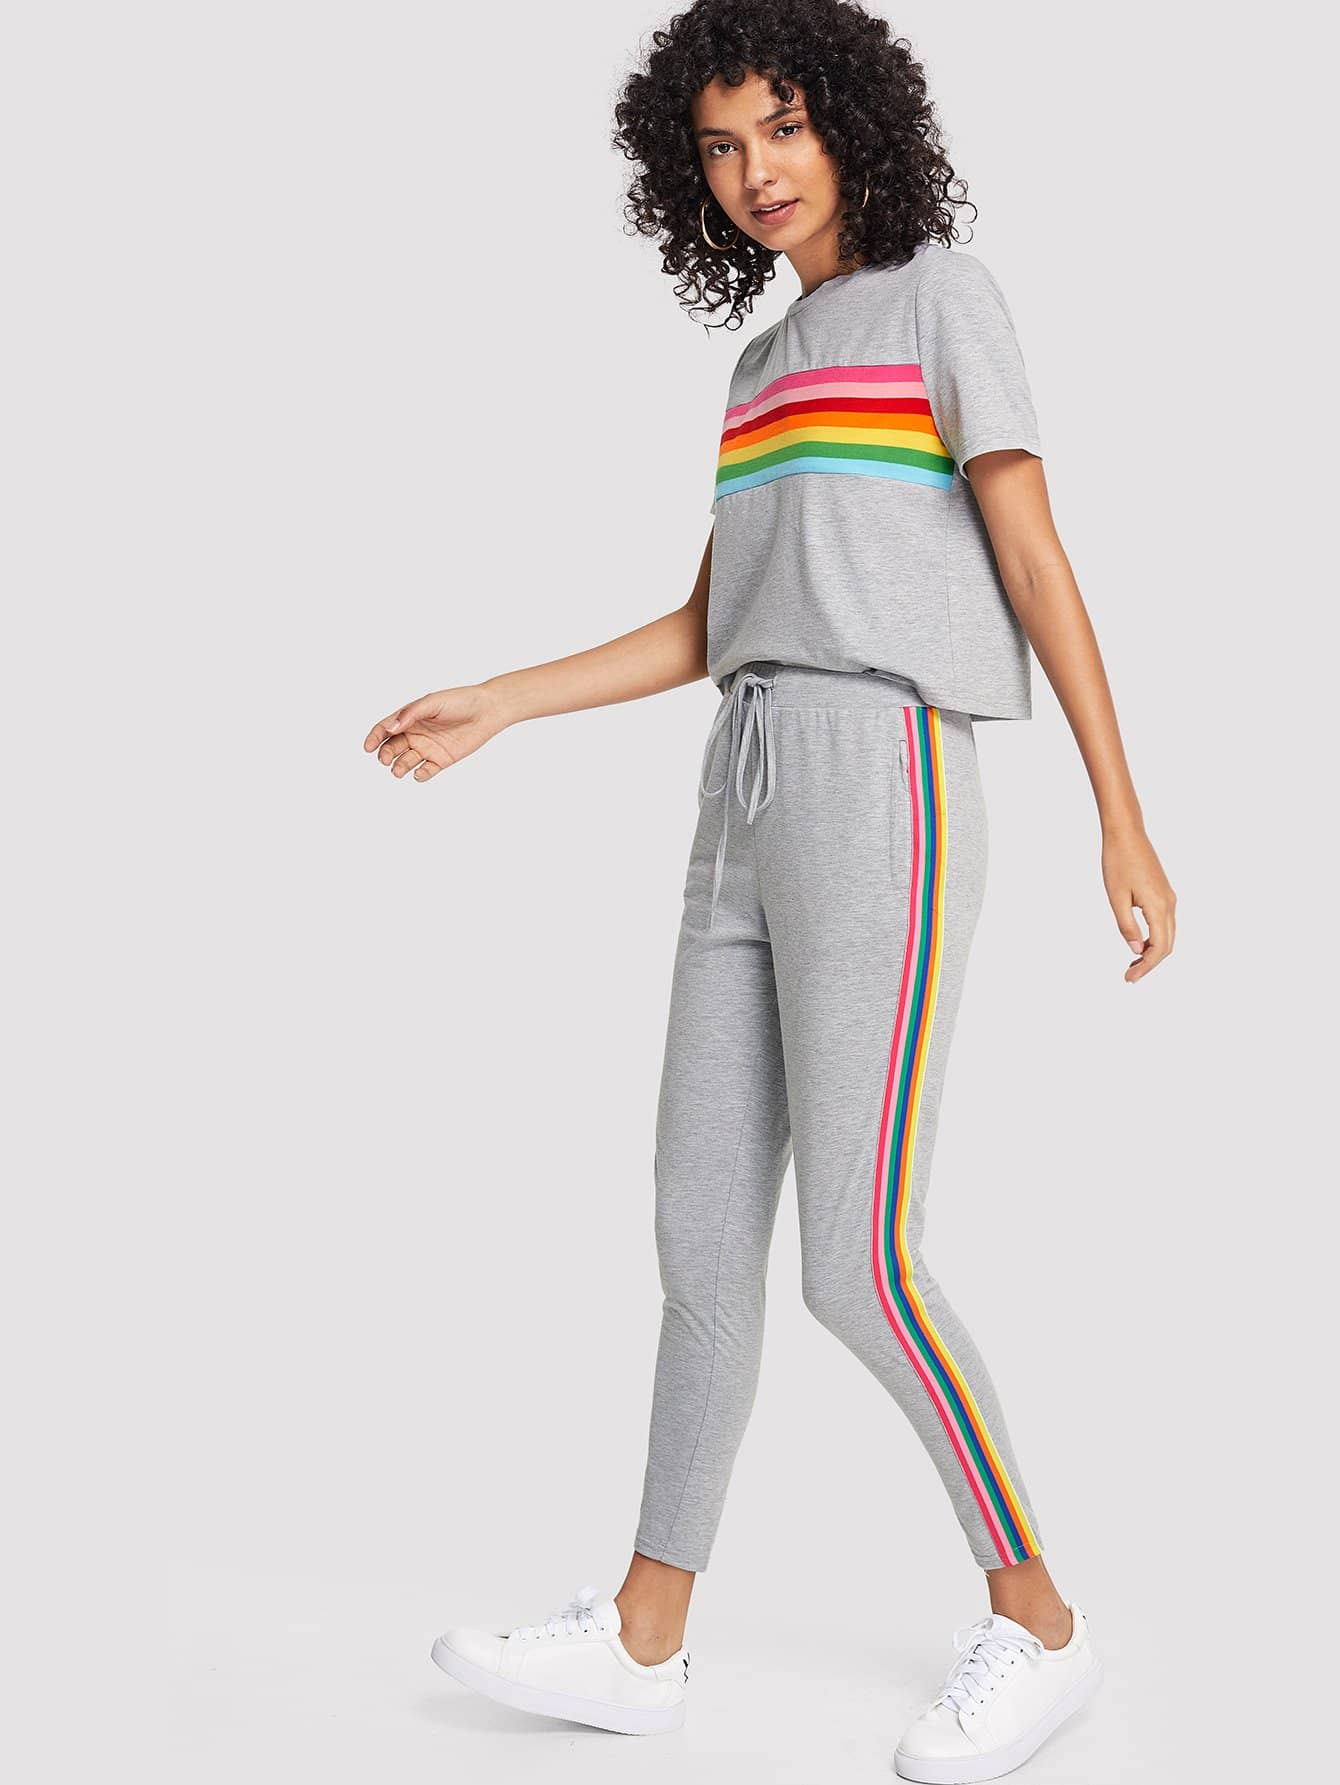 Rainbow Striped Tee & Sweatpants Co-Ord men rainbow striped tee